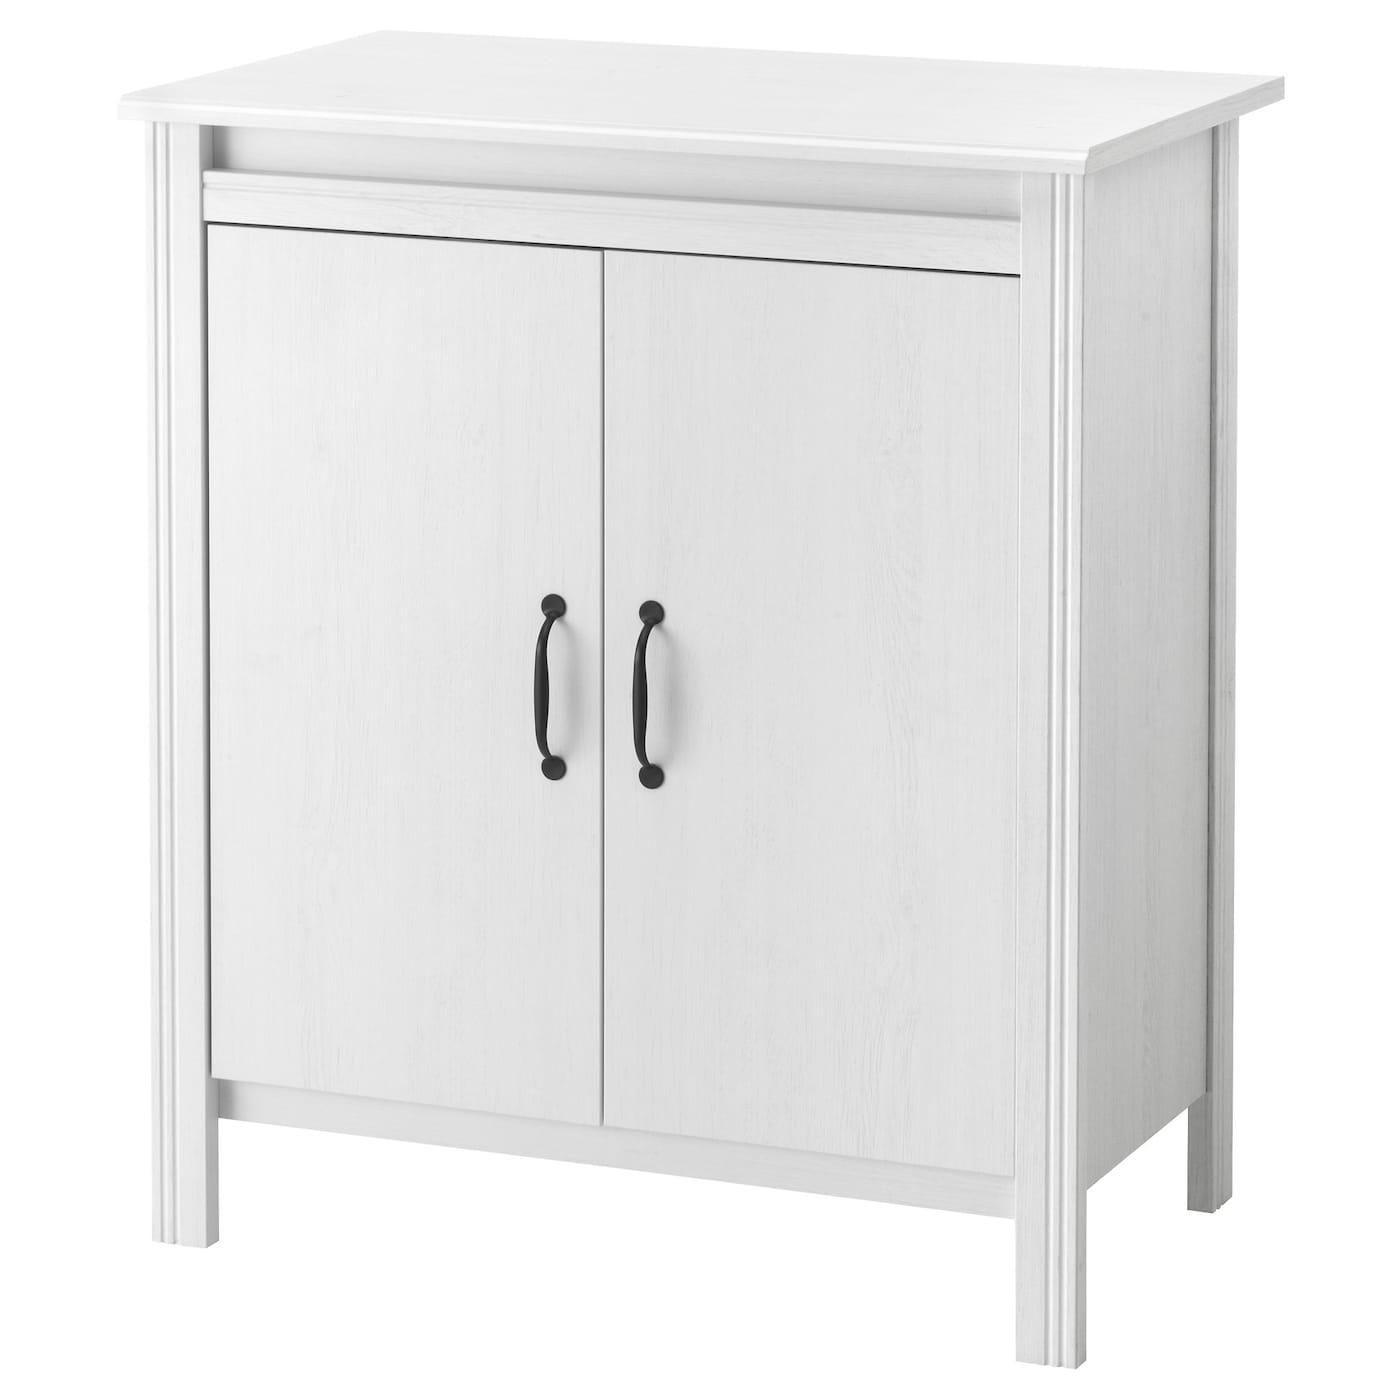 Witte Lage Kast.Opbergkasten Ikea